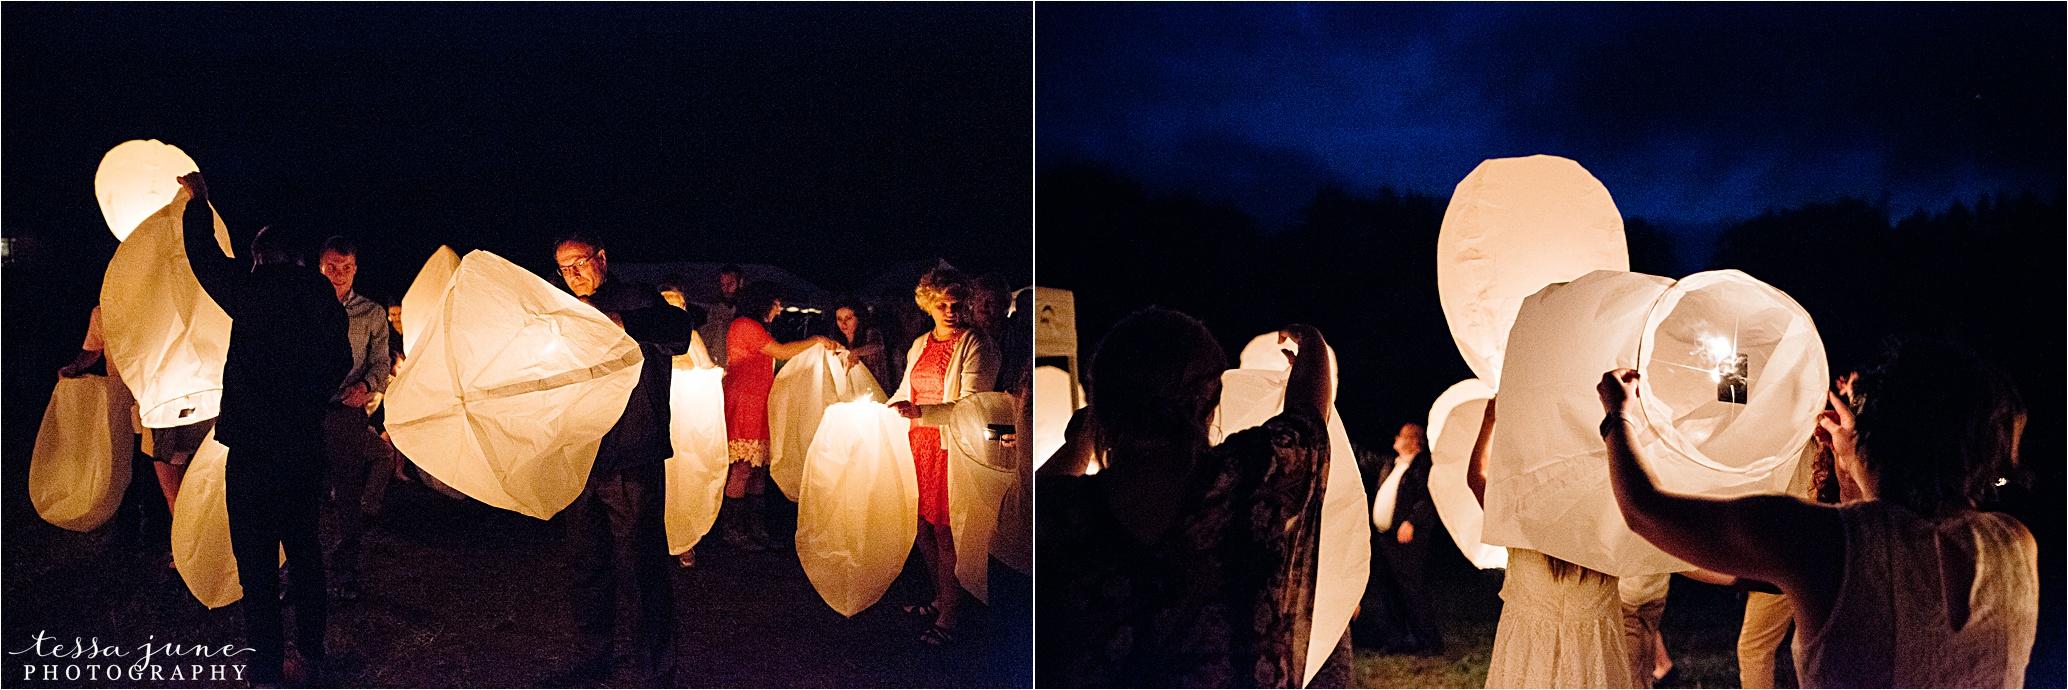 bohemian-forest-wedding-stillwater-minnesota-flower-crown-st-cloud-photographer-floating-lantern-sendoff